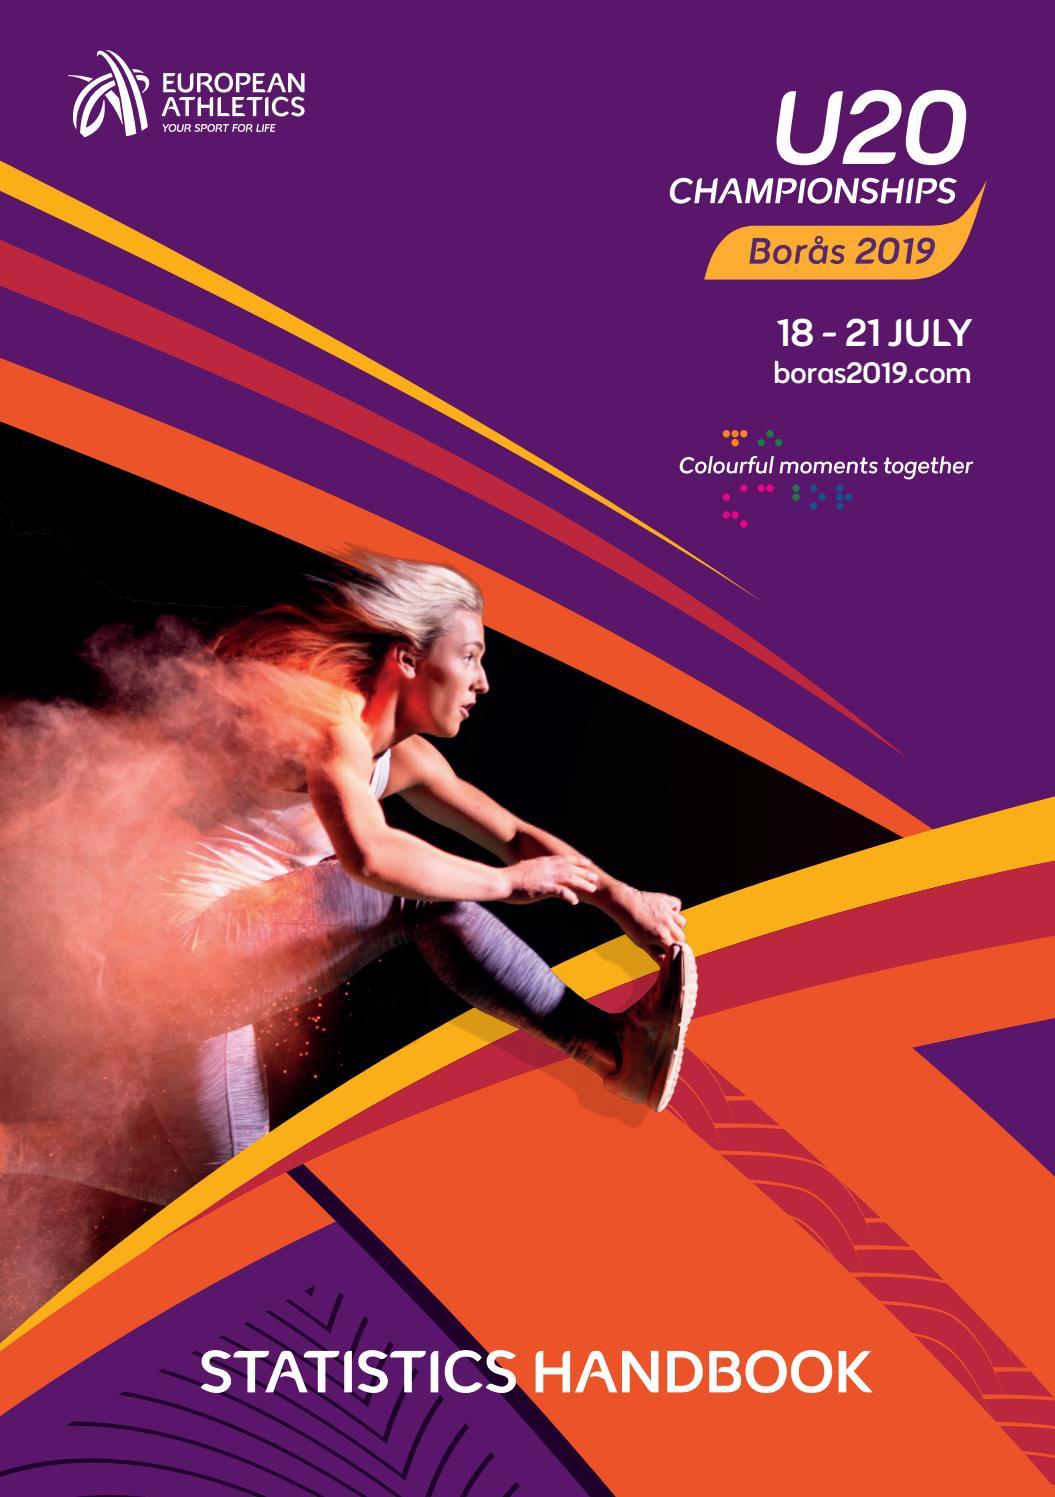 Anastasia Sergeyeva statistics handbook - european athletics u20 championships